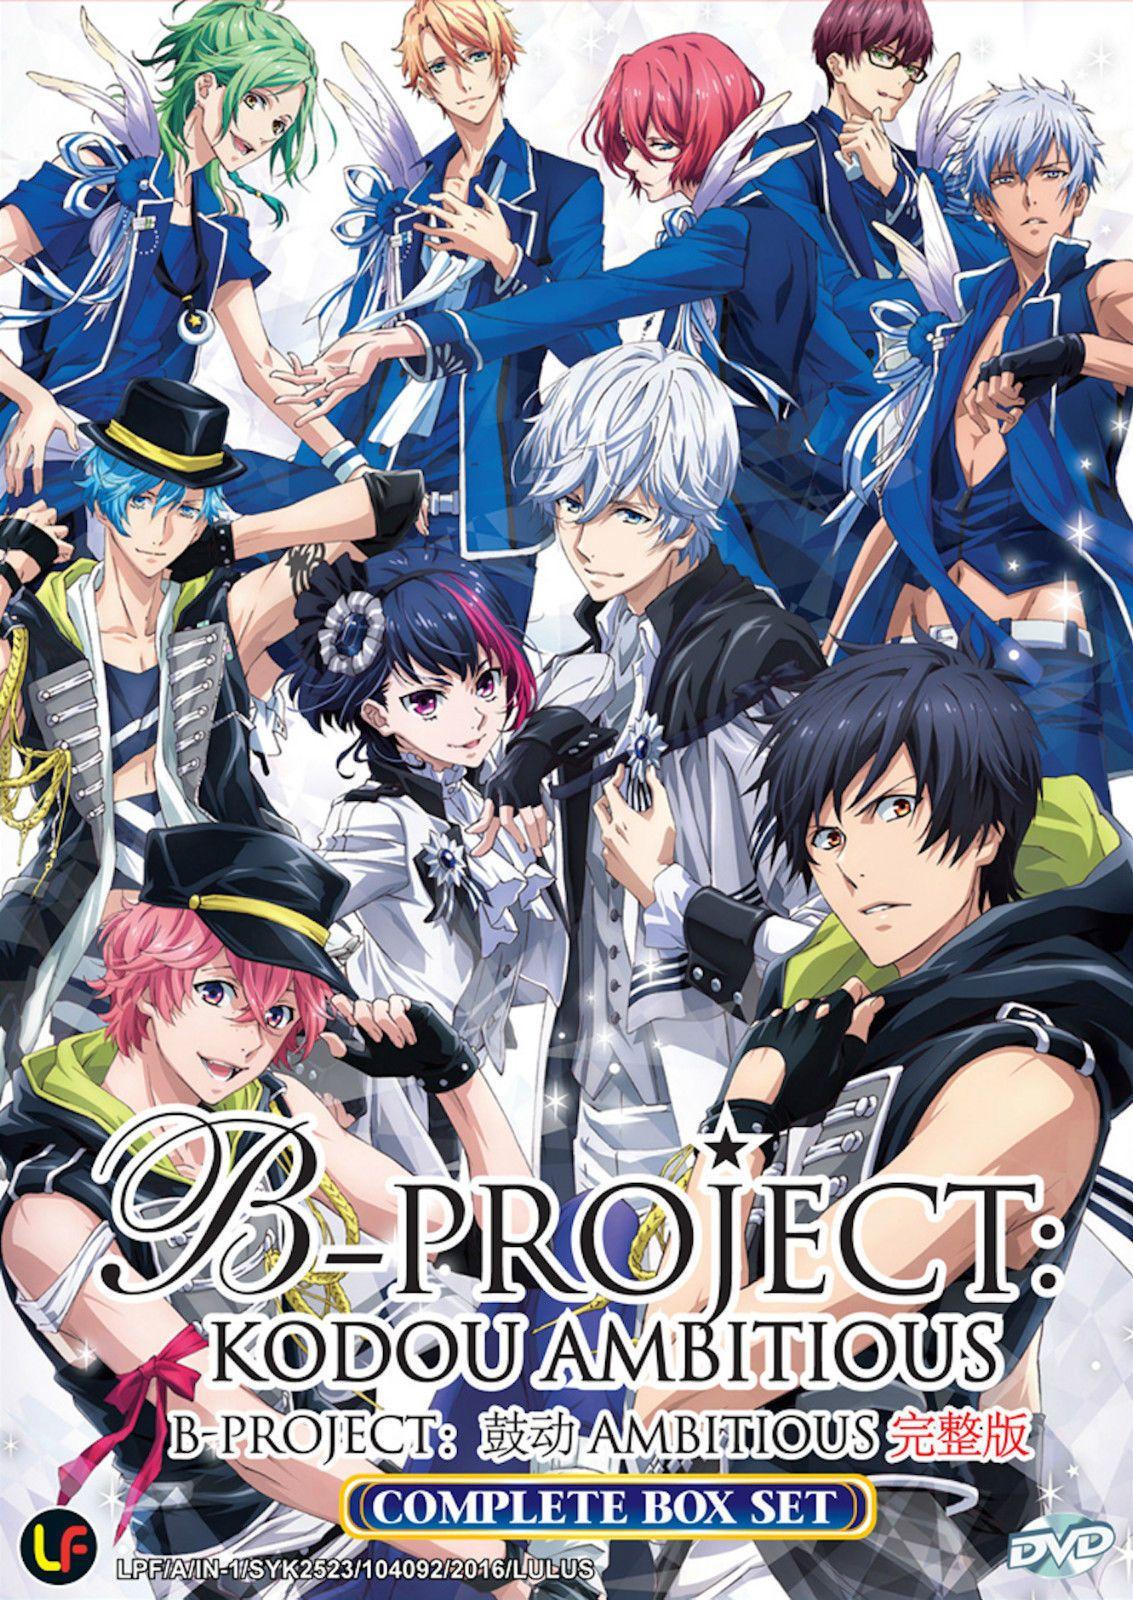 Dvd b project kodou ambitious vol 1 12 end good english sub free anime